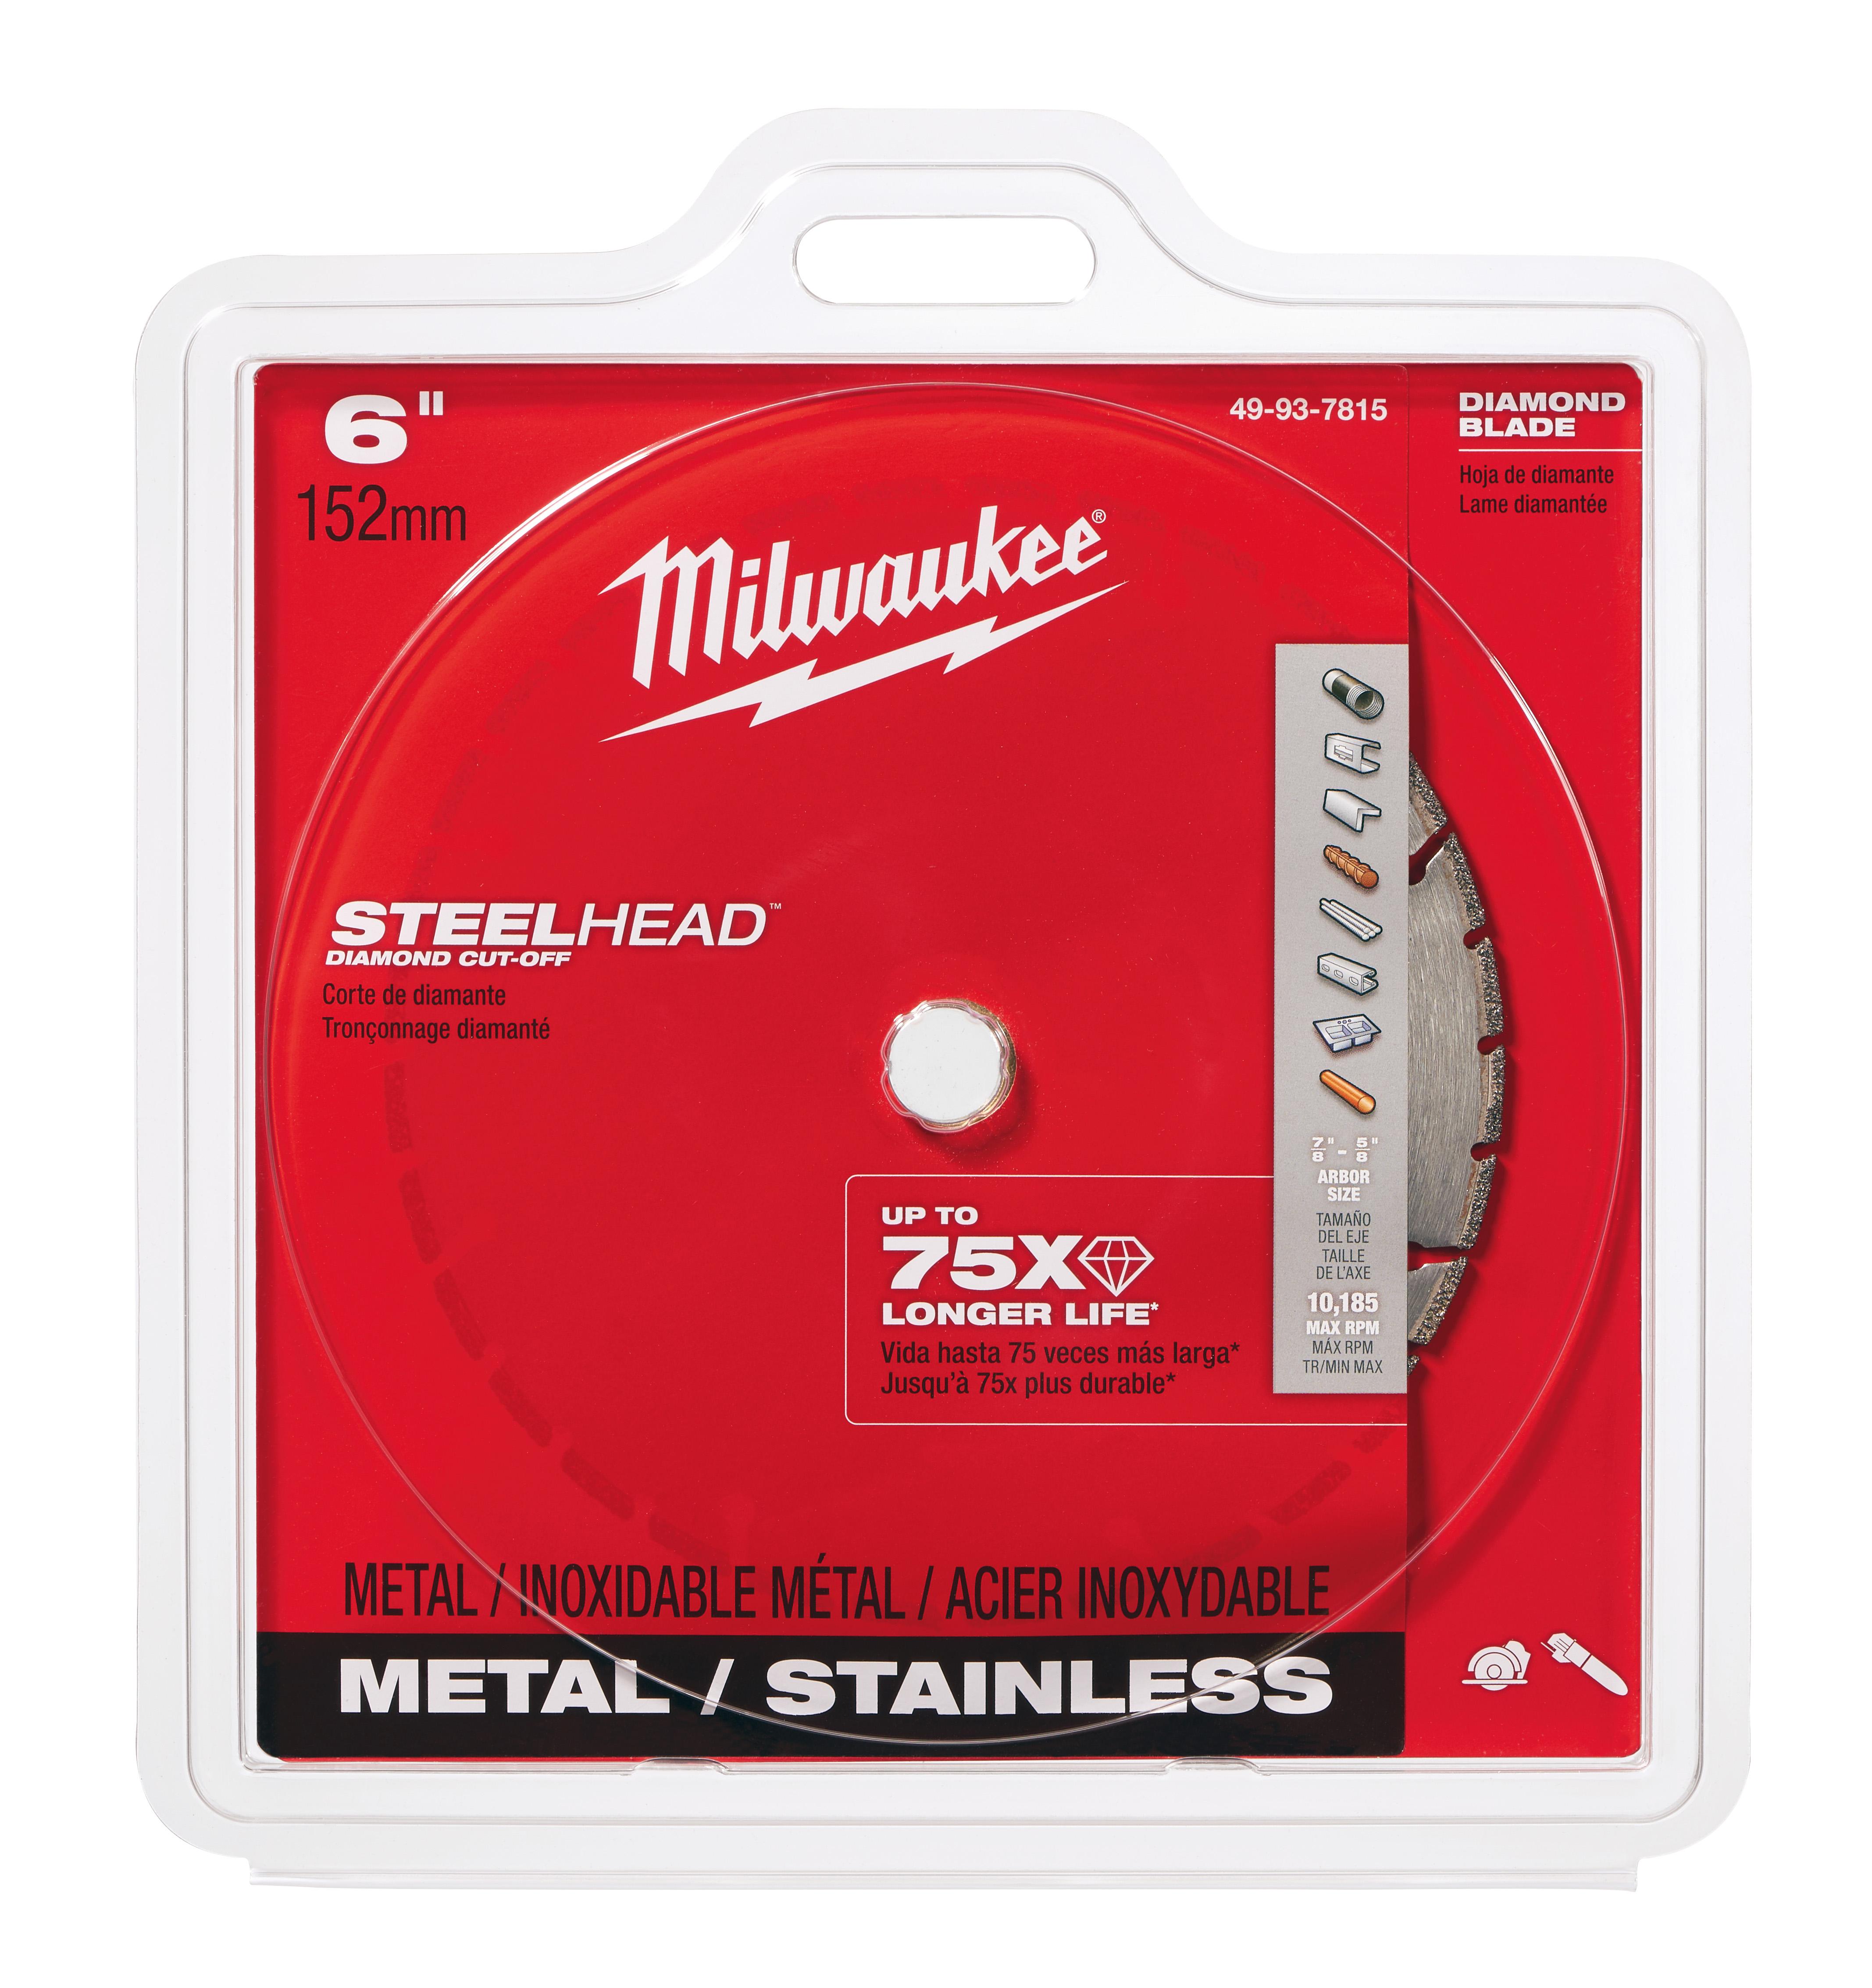 Milwaukee® 49-93-7815 Segmented Diamond Cut-Off Blade, 6 in Dia Blade, 0.05 in W, 5/8 to 7/8 in Arbor/Shank, Dry Cutting